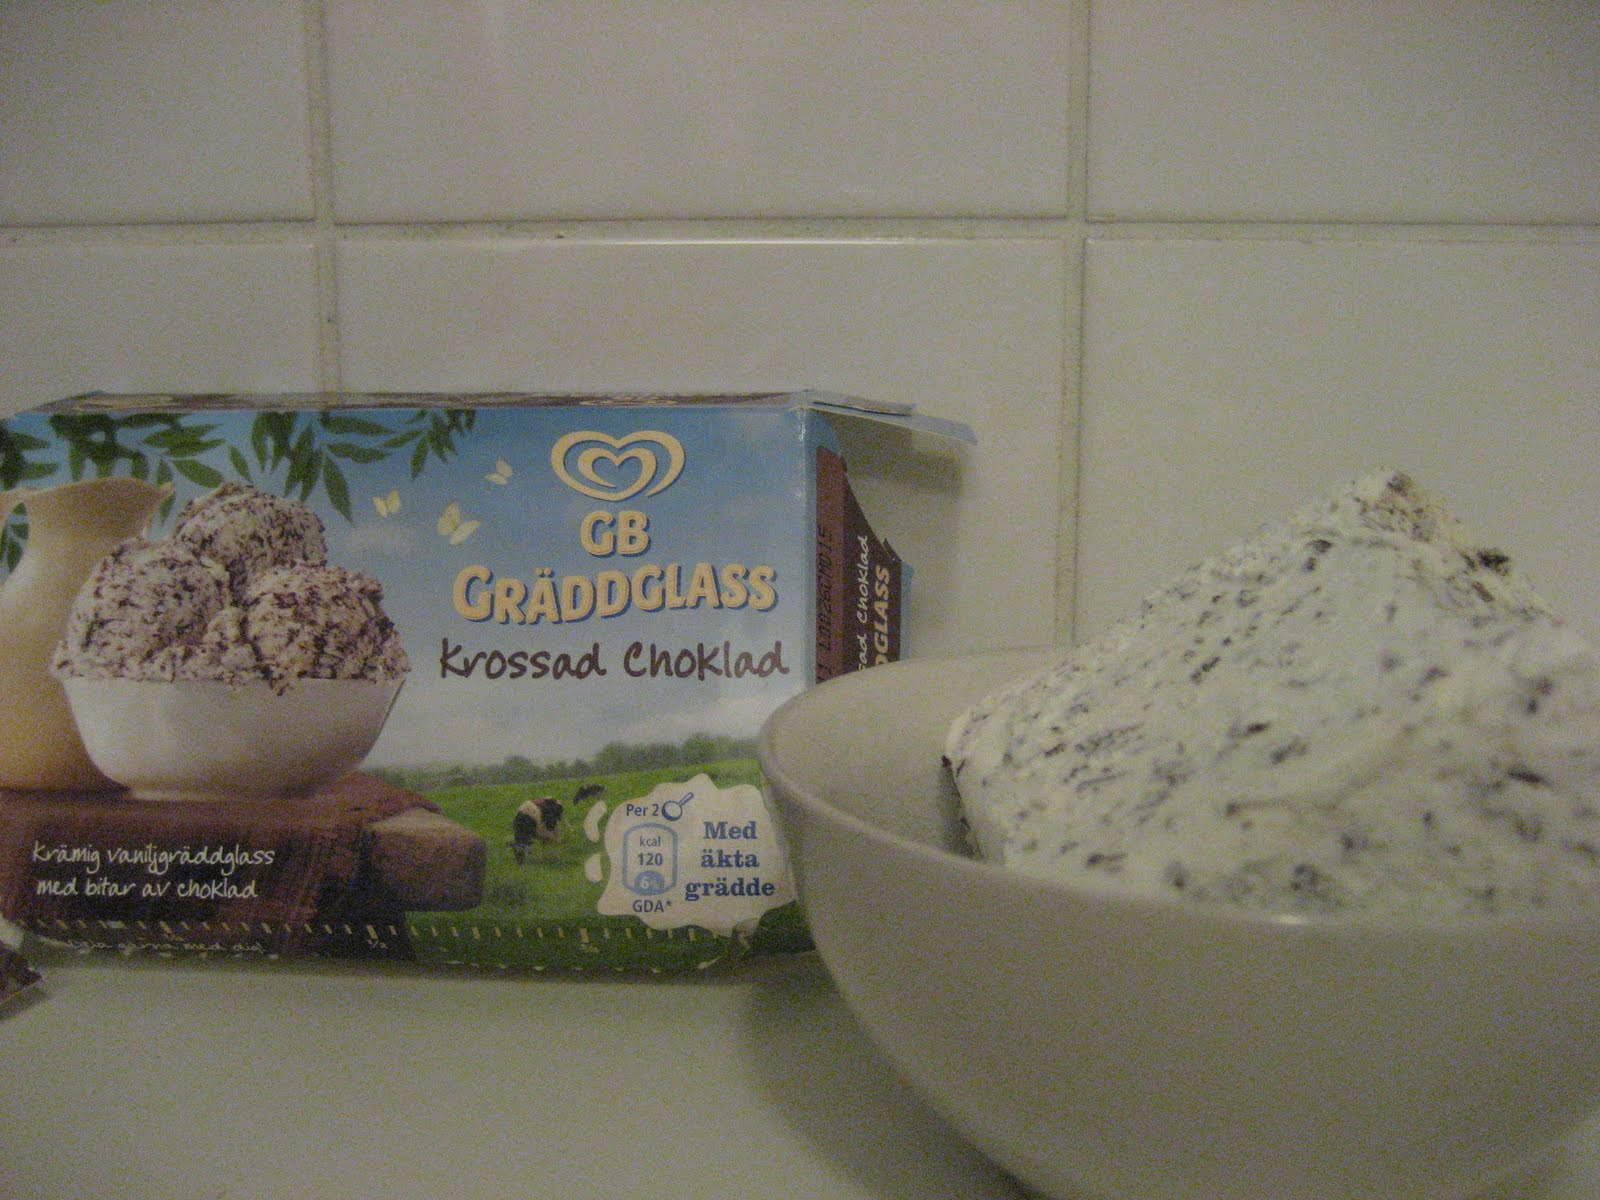 gb krossad choklad